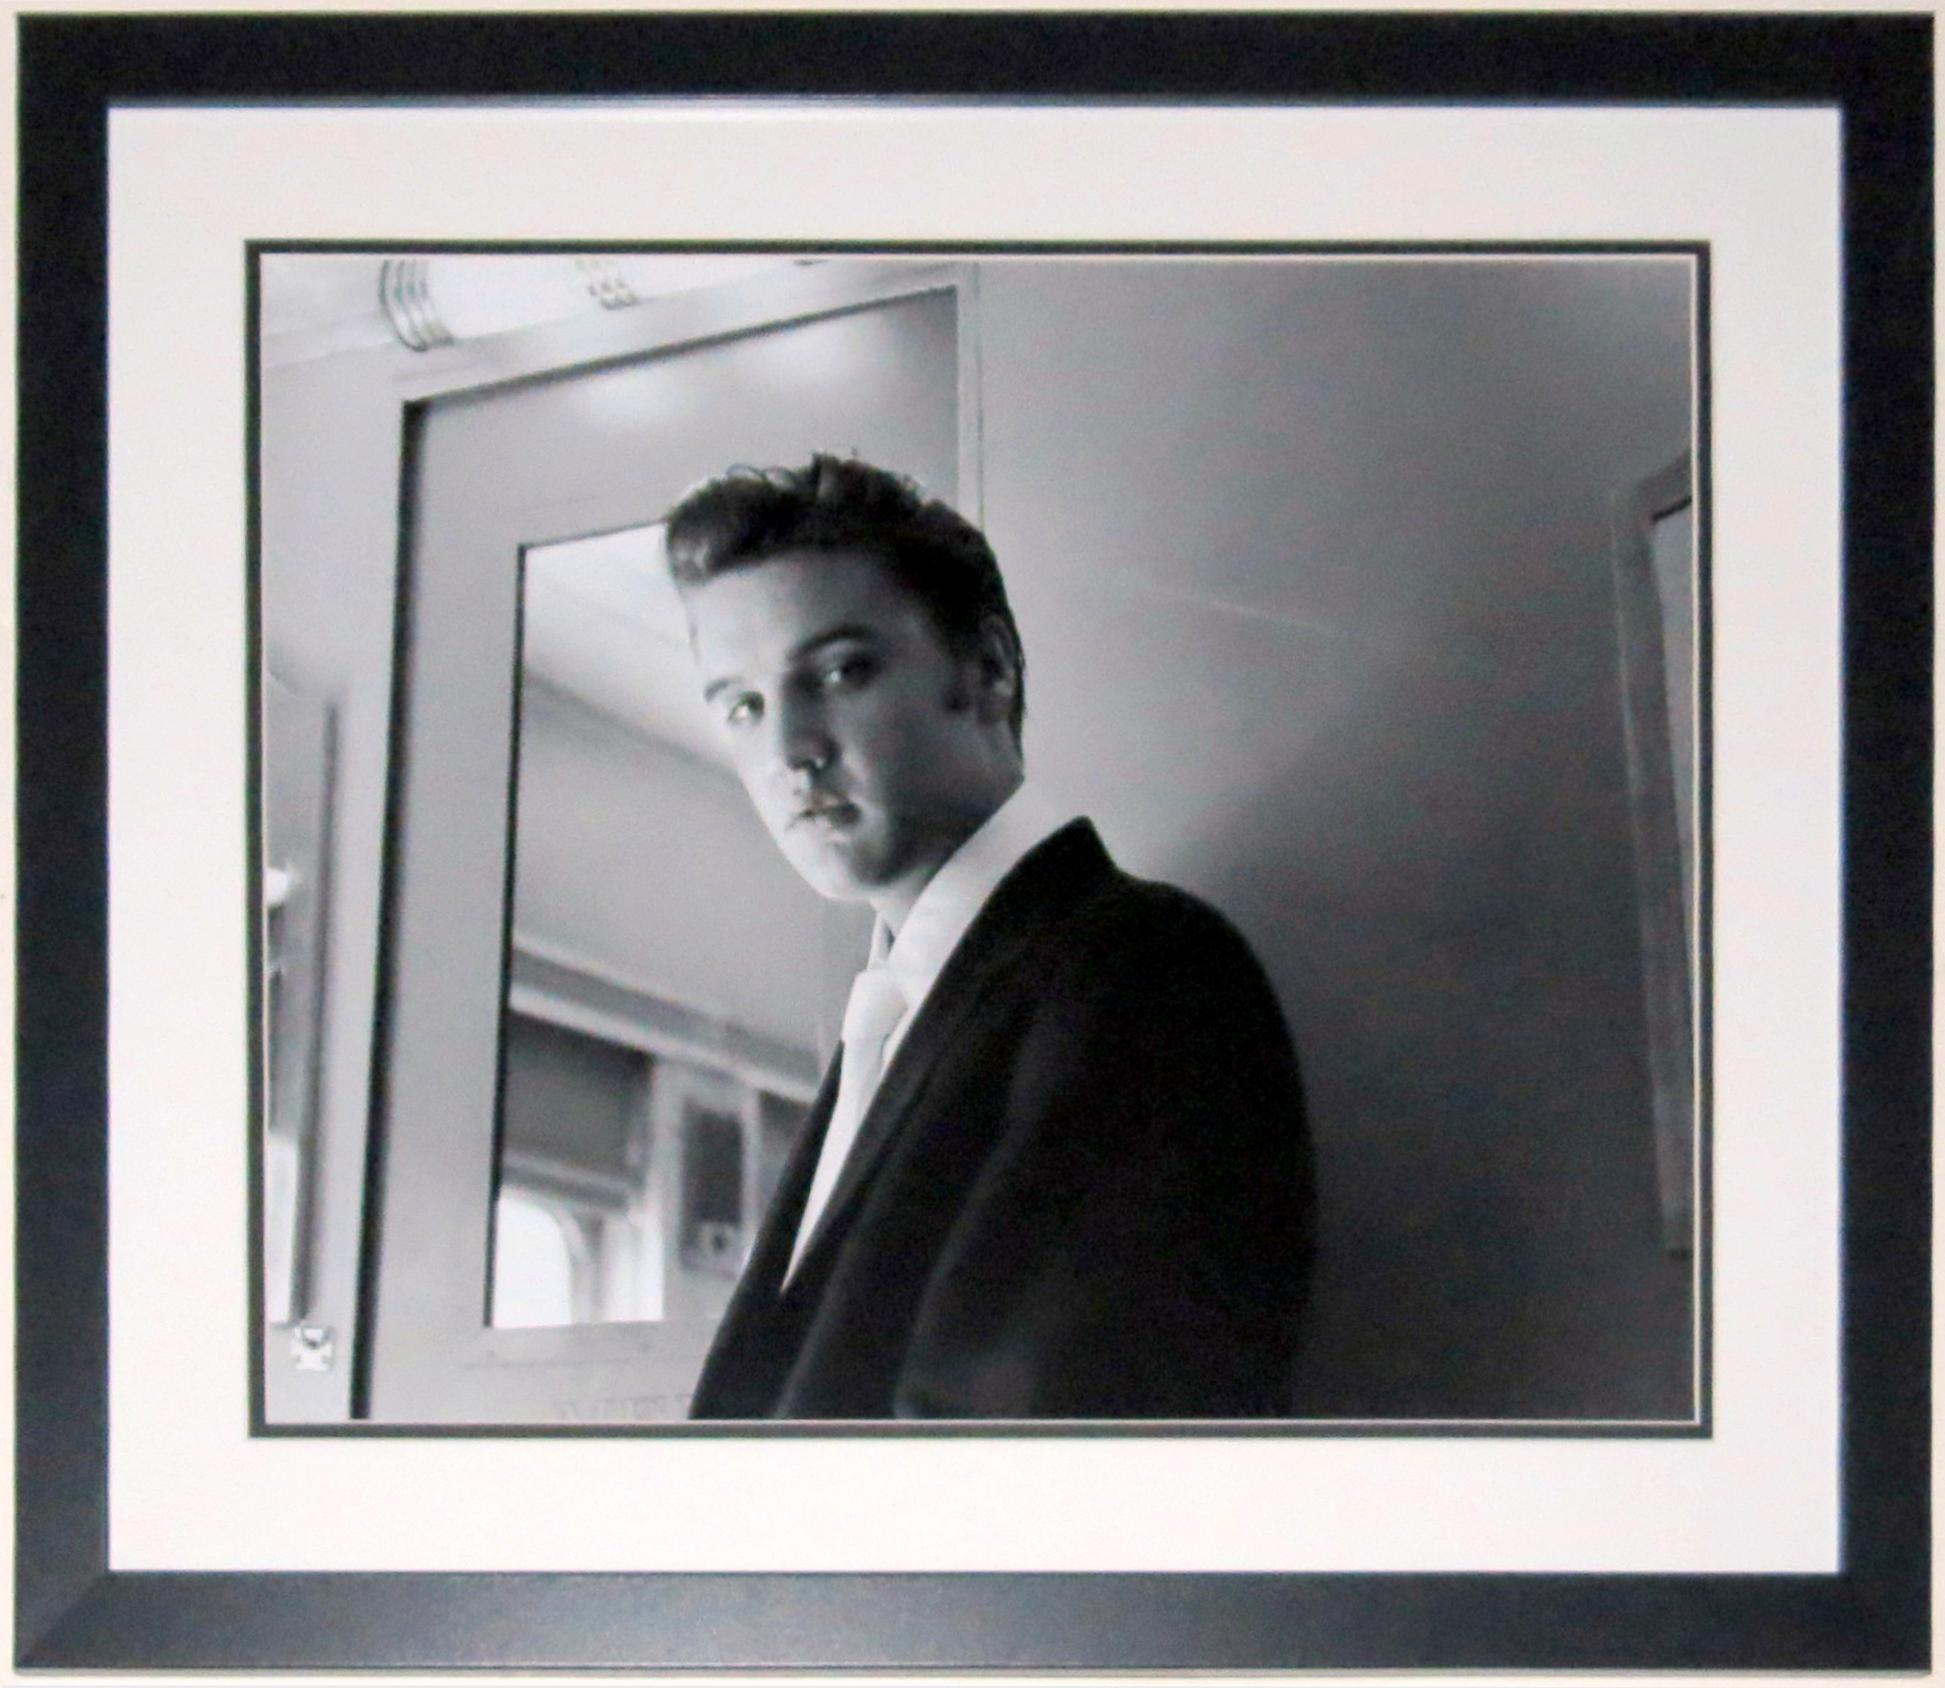 Elvis Presley 16x20 Photo - Professionally Framed